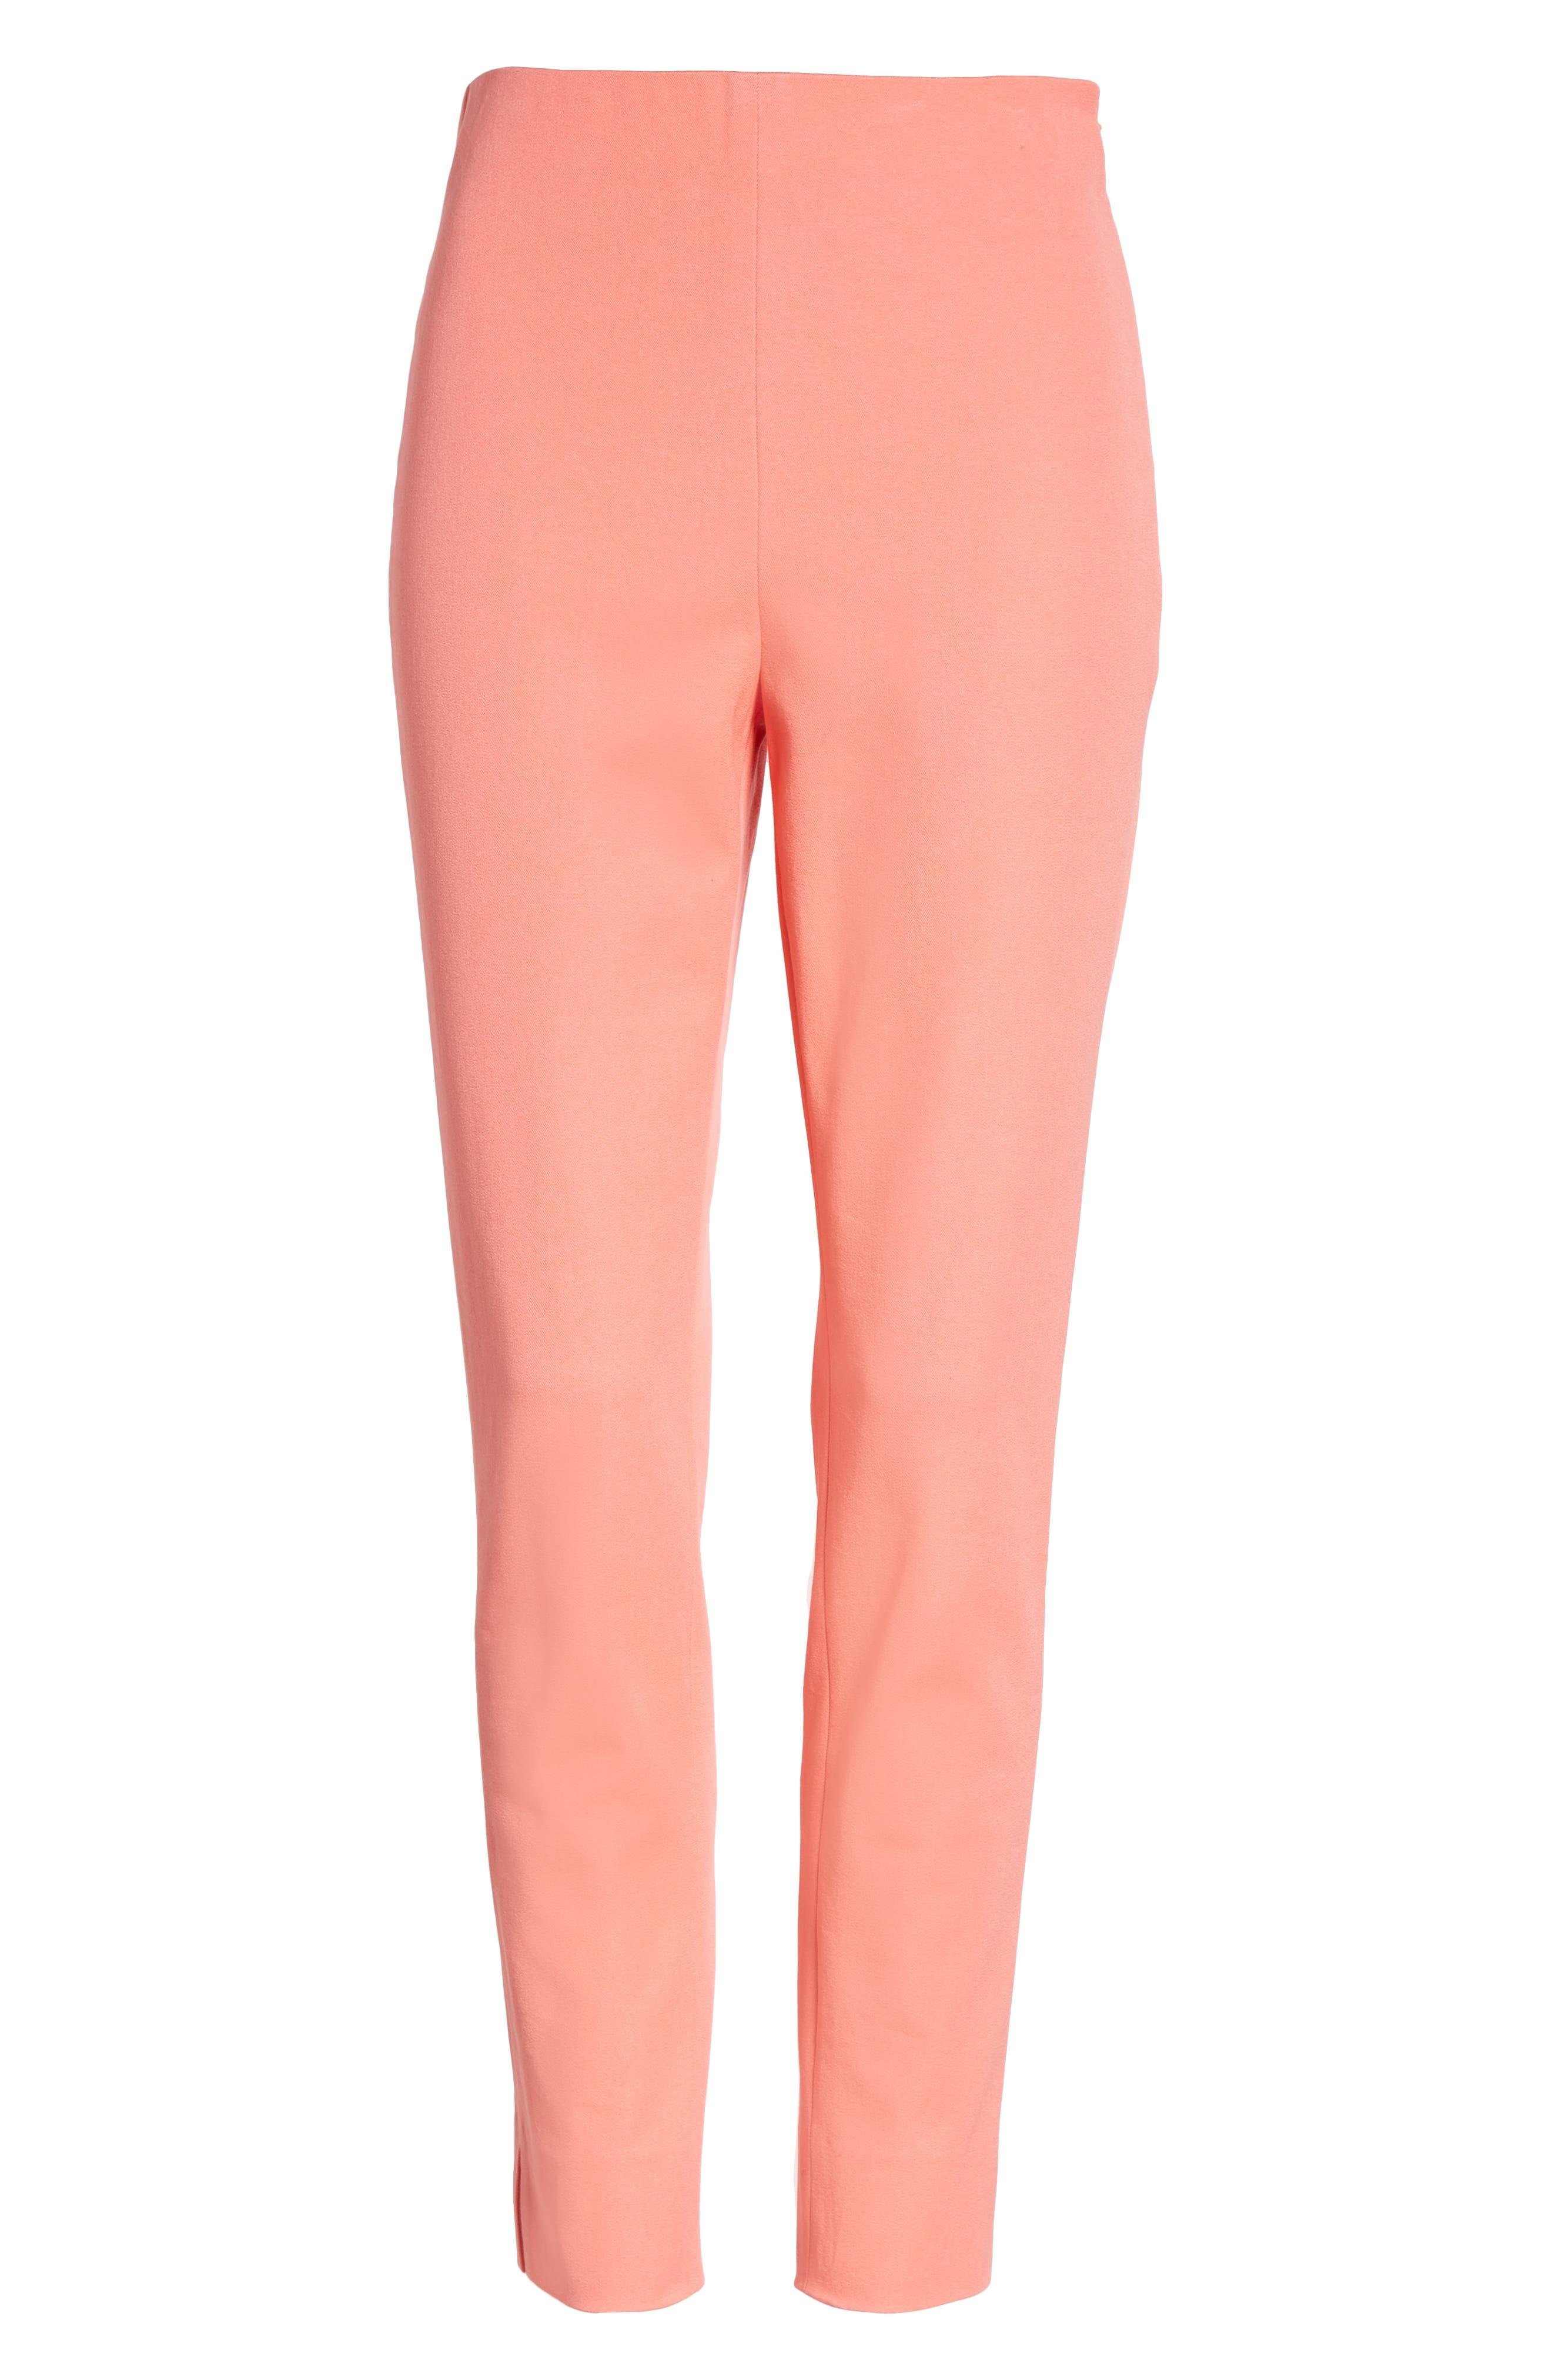 Skinny Stretch Pants,                             Alternate thumbnail 7, color,                             Coral Sugar